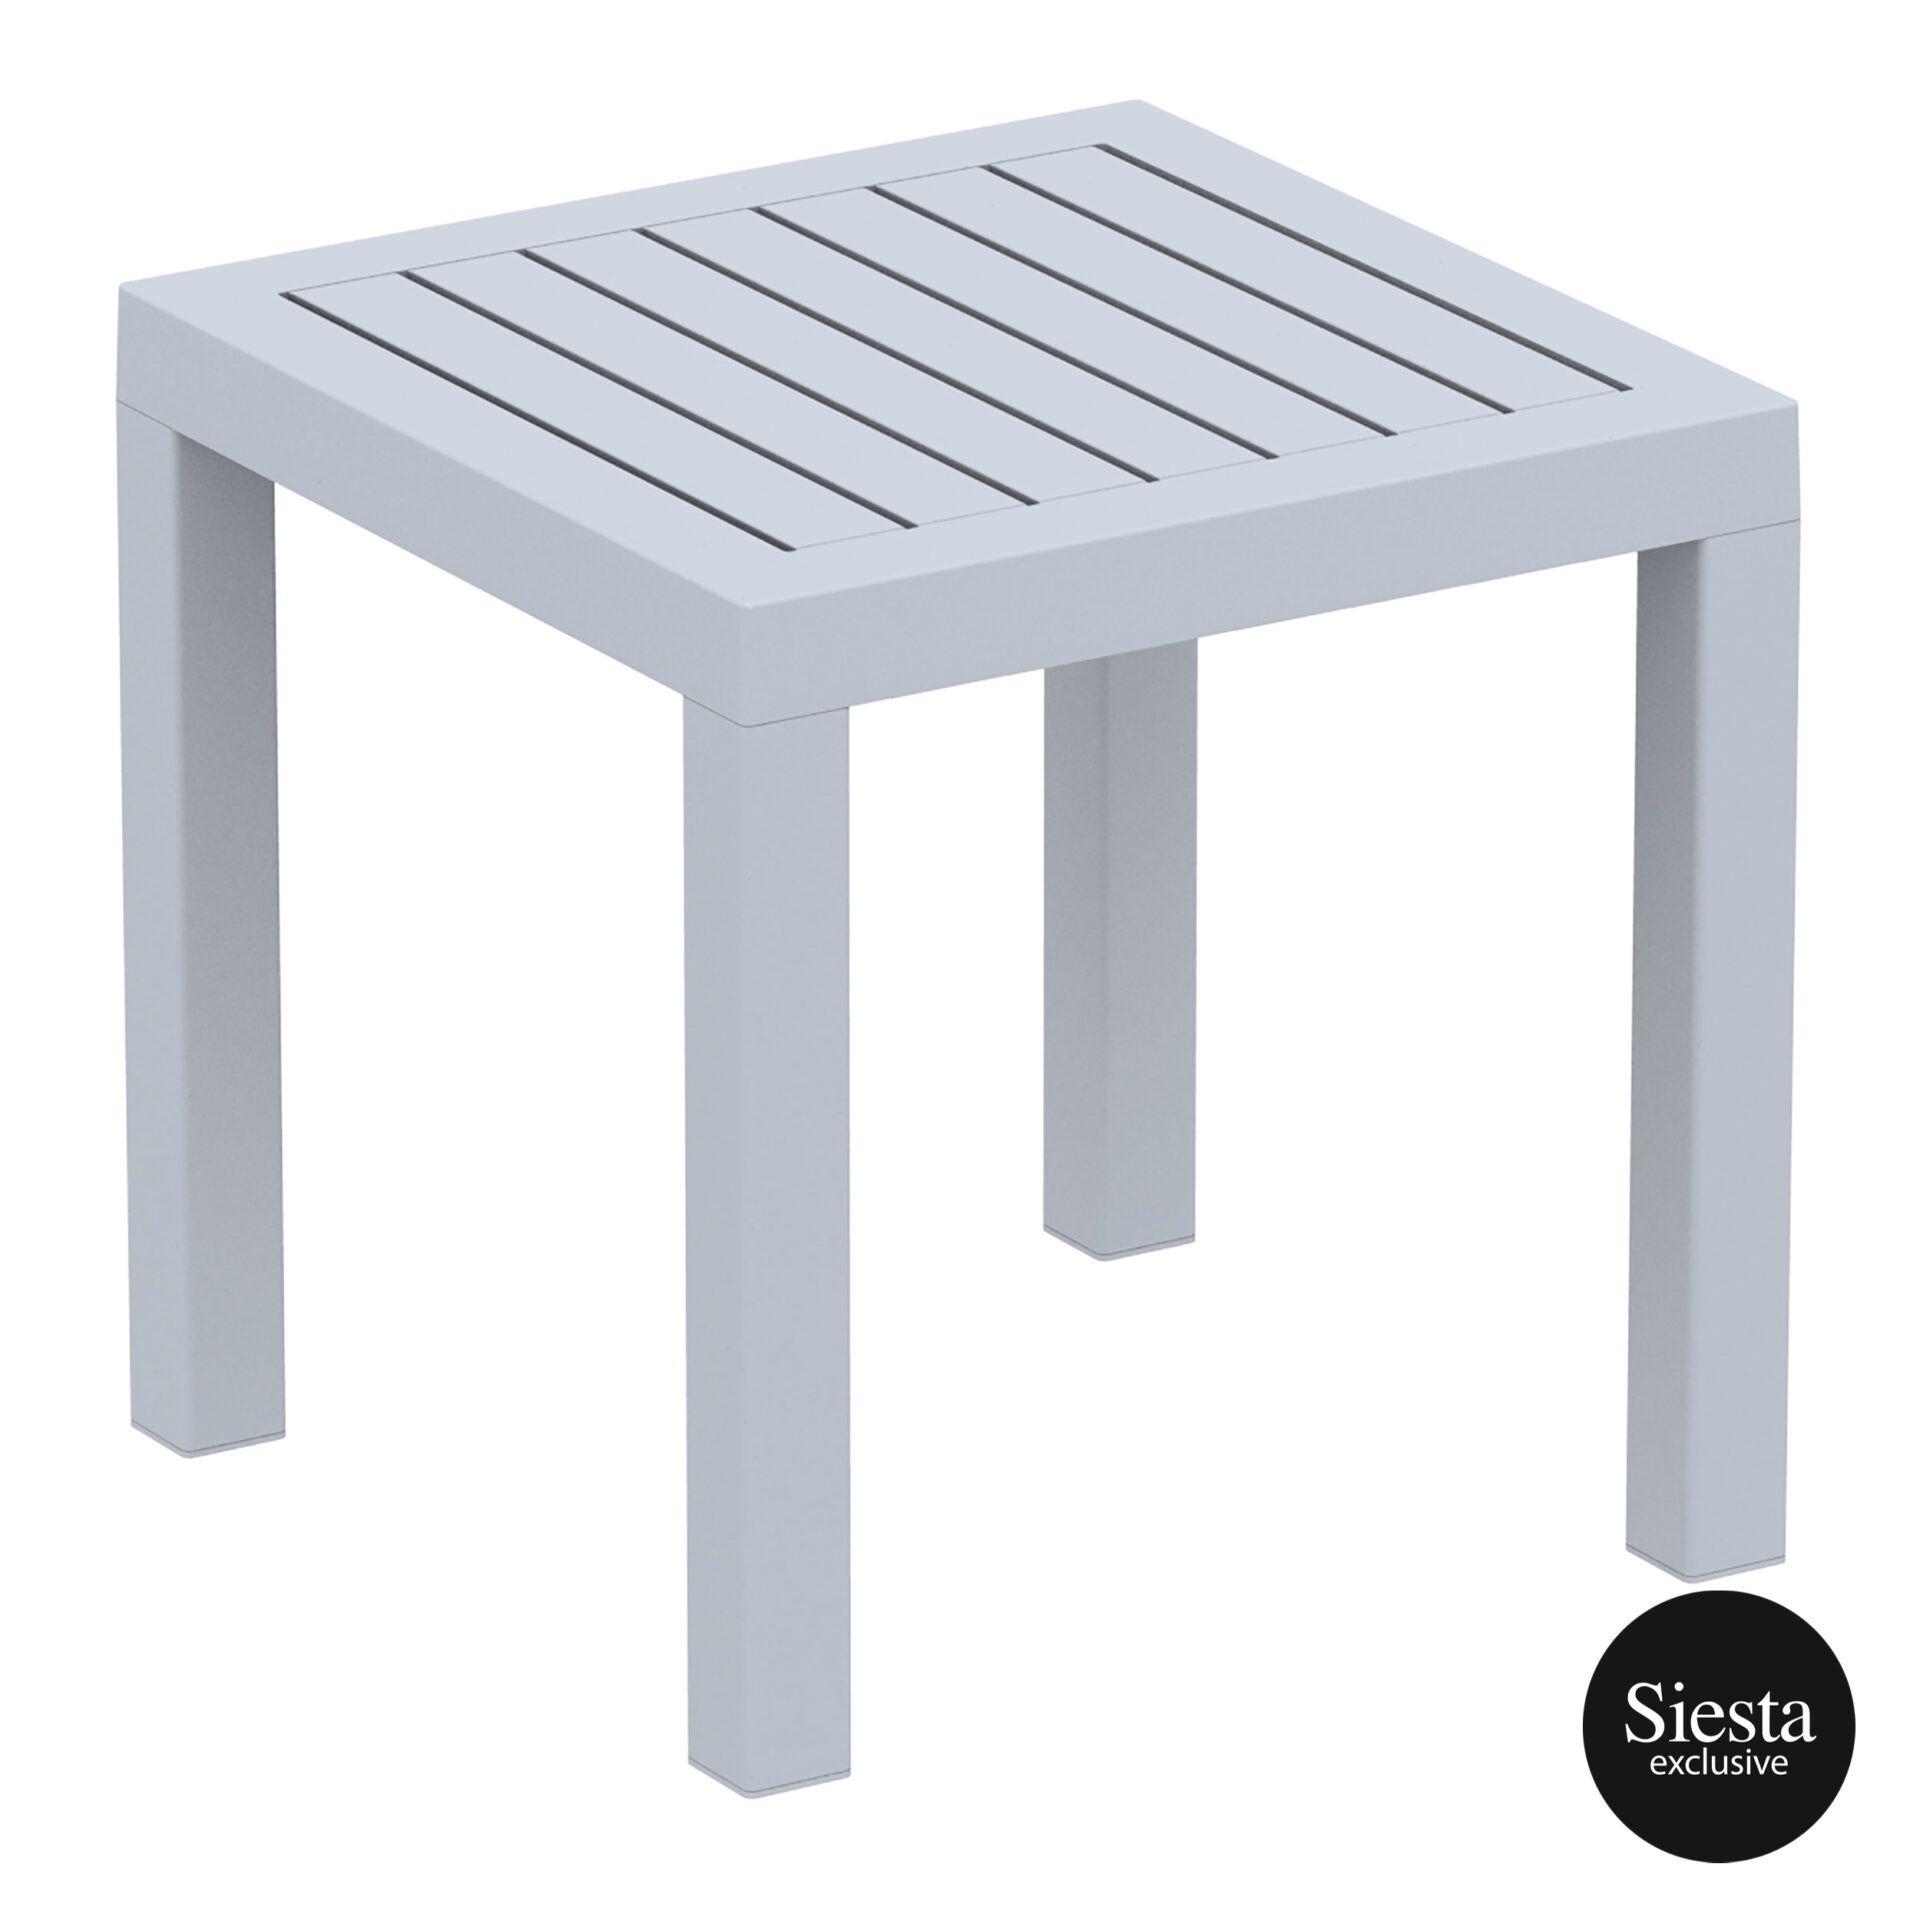 plastic outdoor resort ocean side table silvergrey front side 2